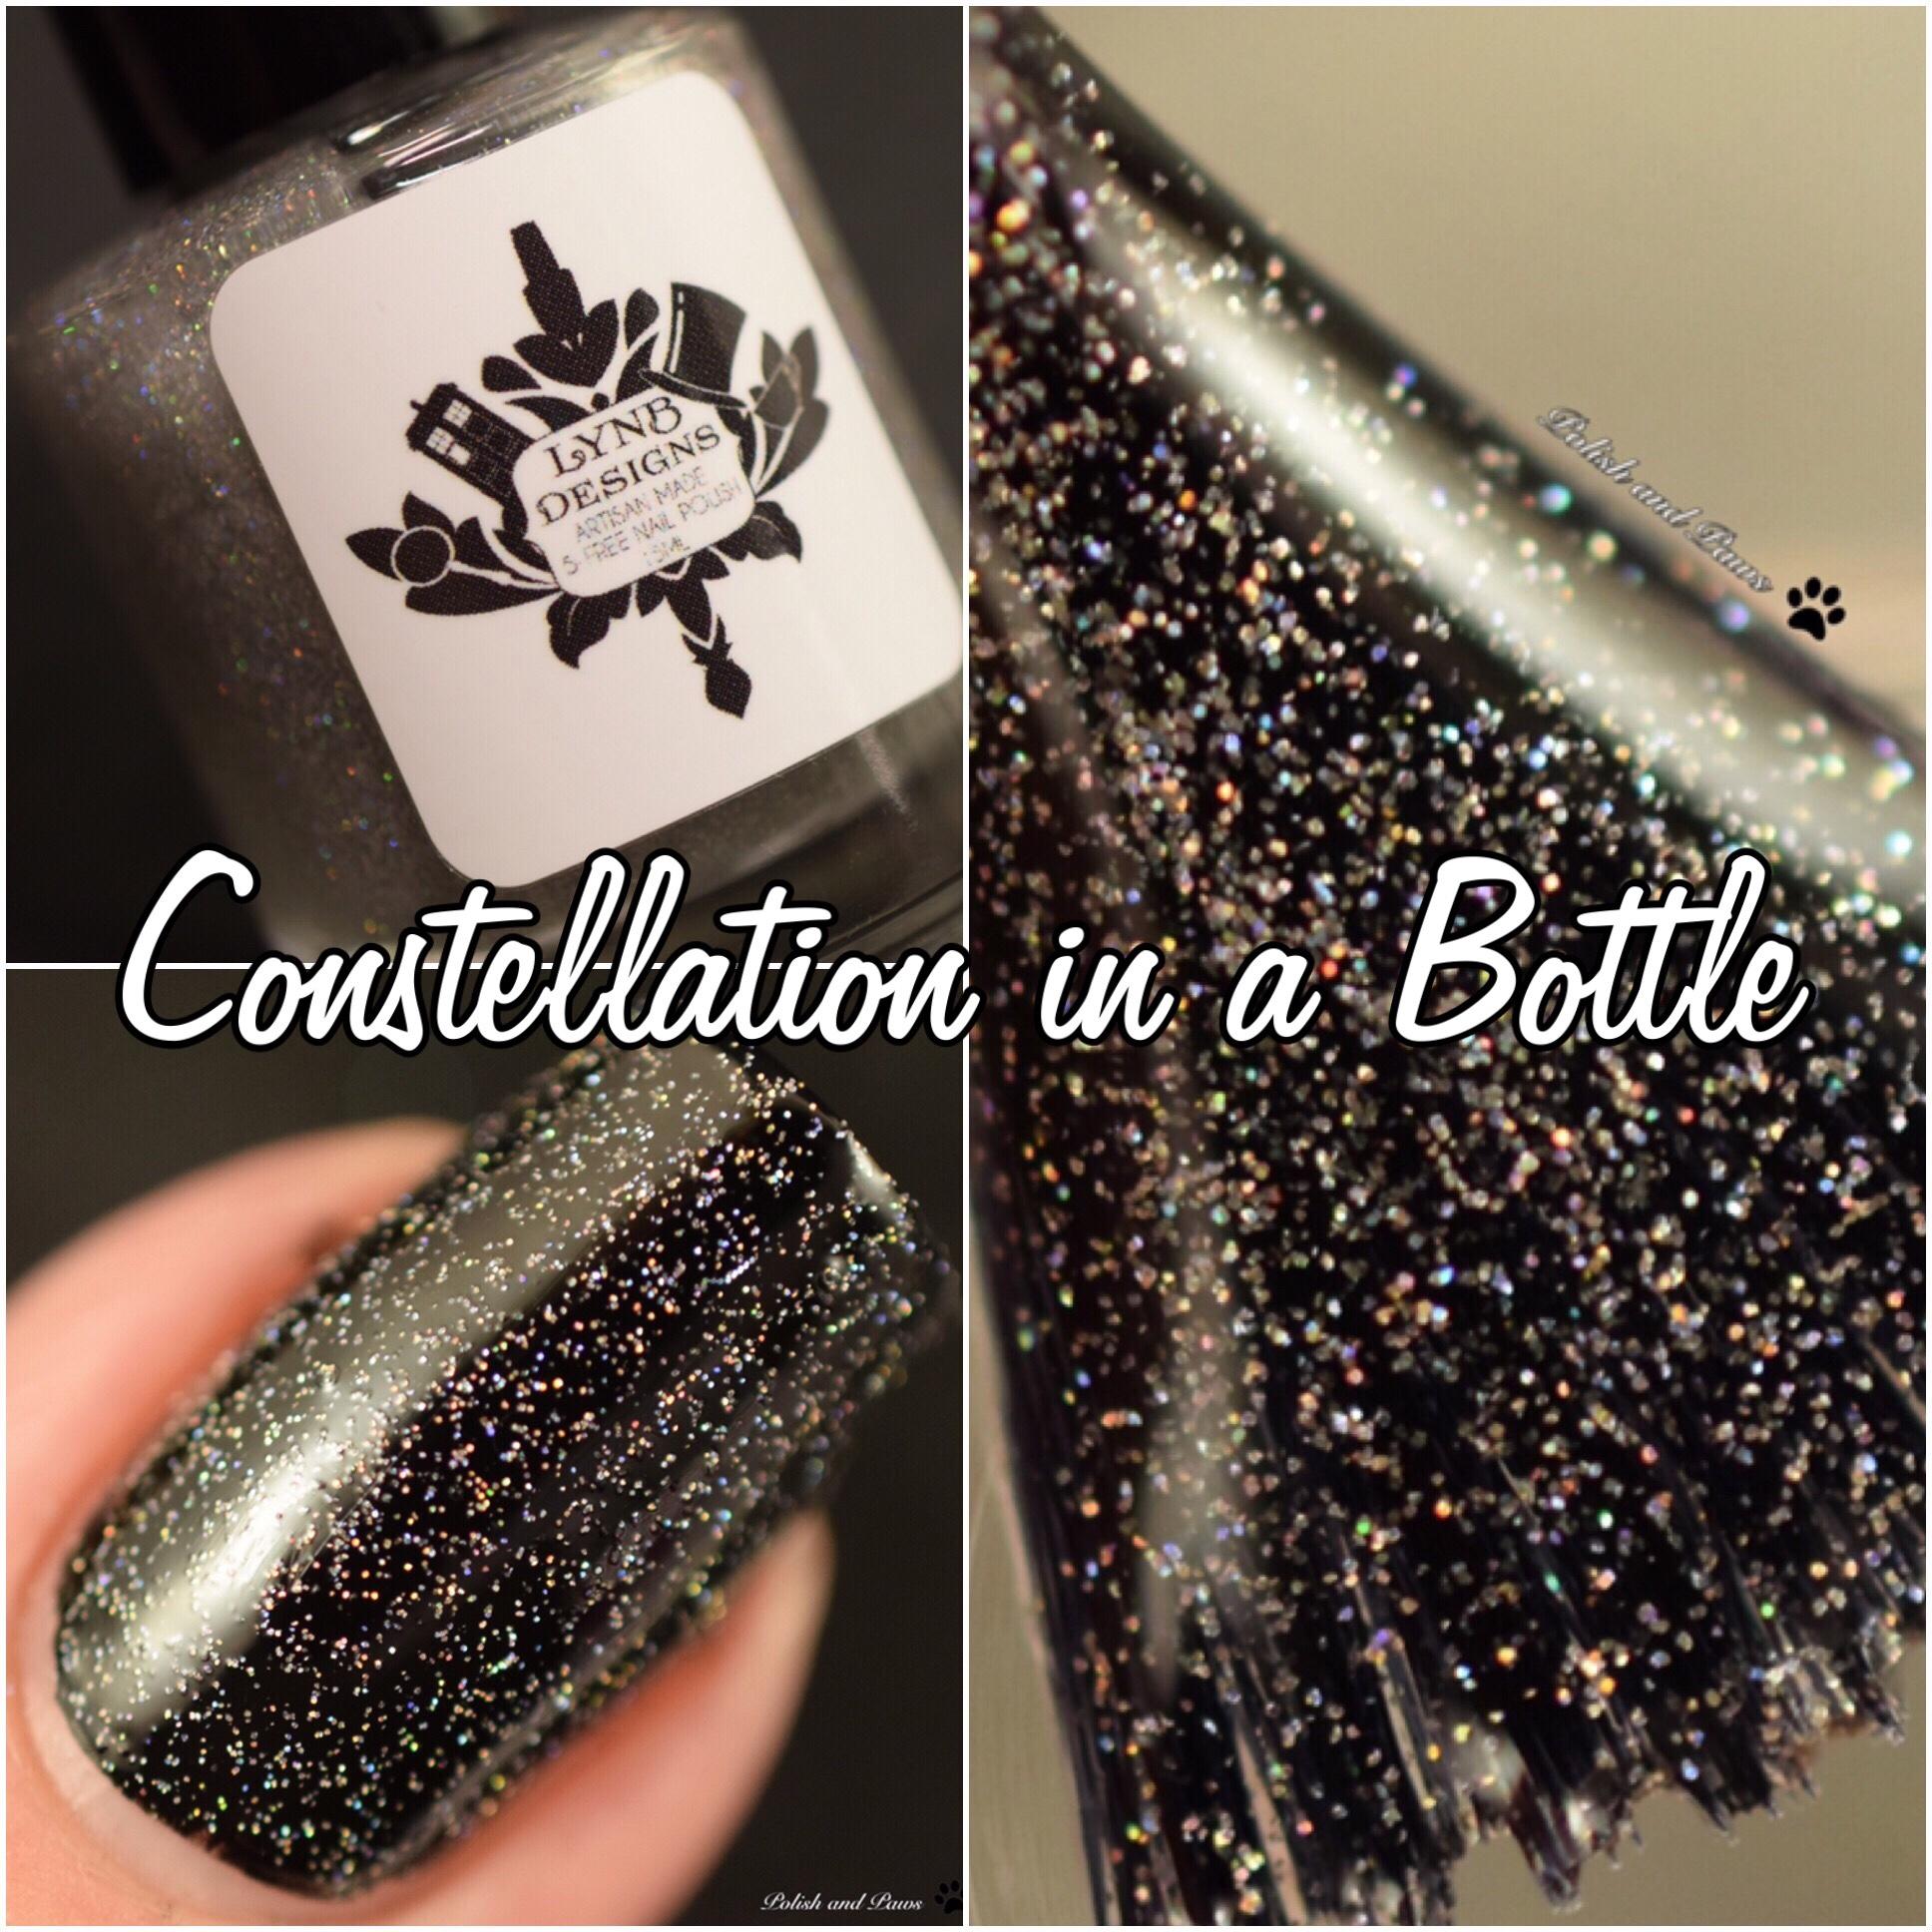 LynB Designs Constellation in a Bottle